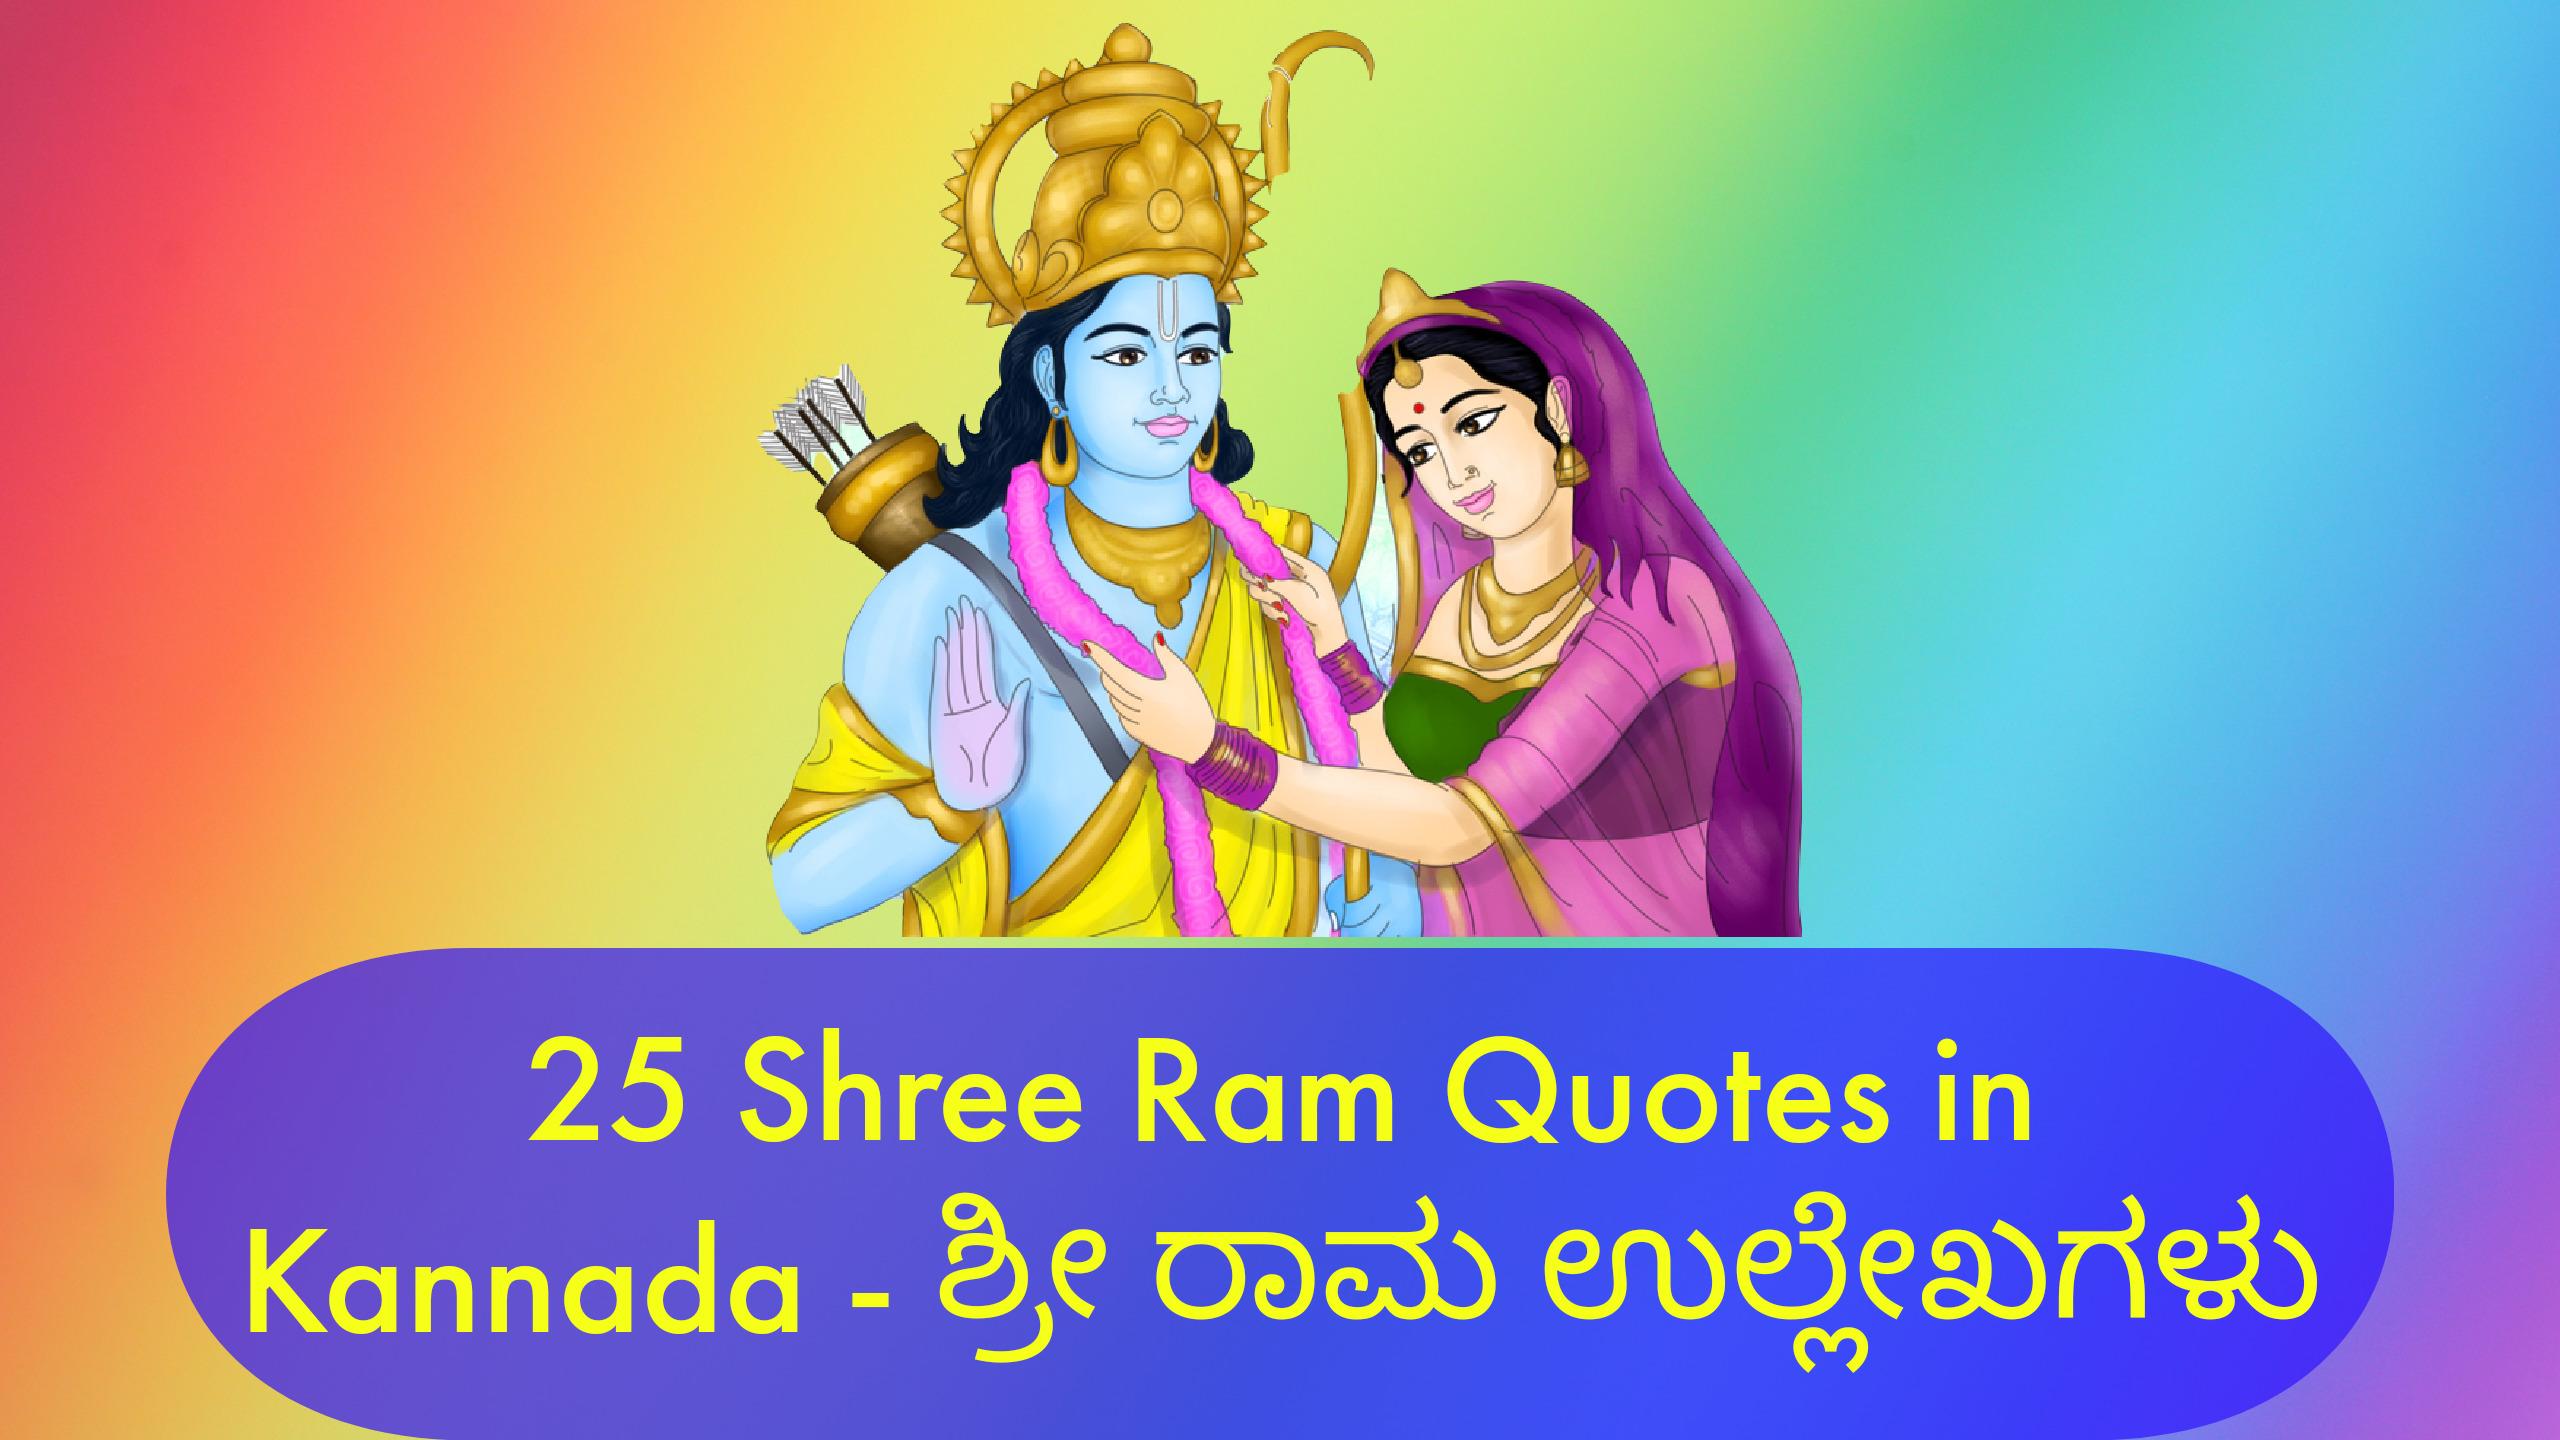 Shree Ram Quotes in Kannada